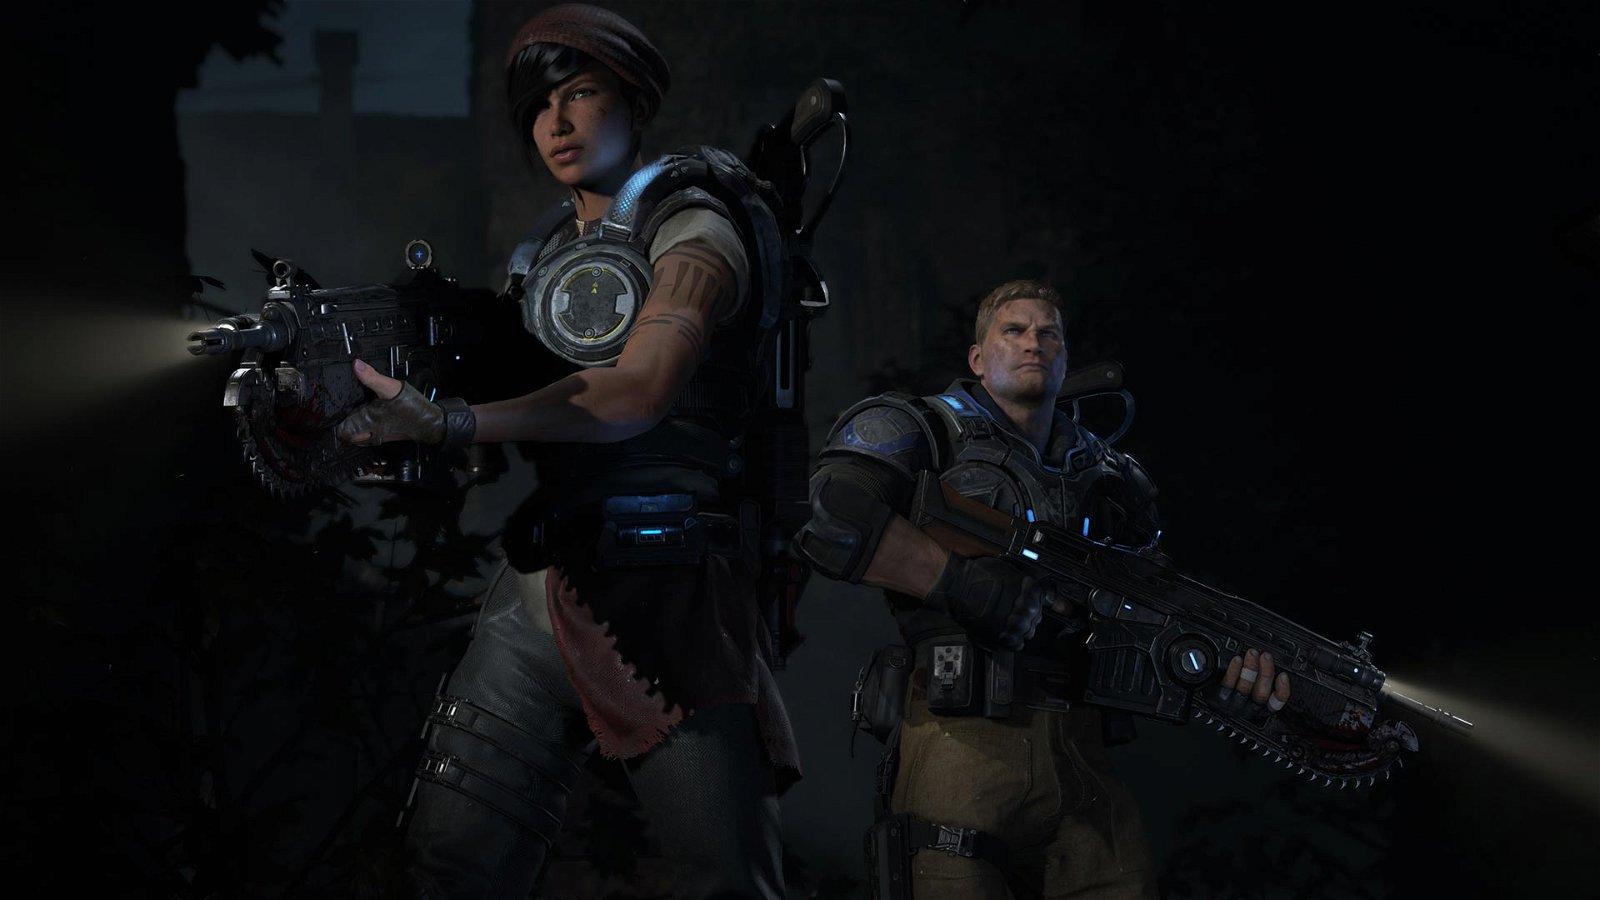 E3 2016: Gears of War 4 Behind Closed Doors 1